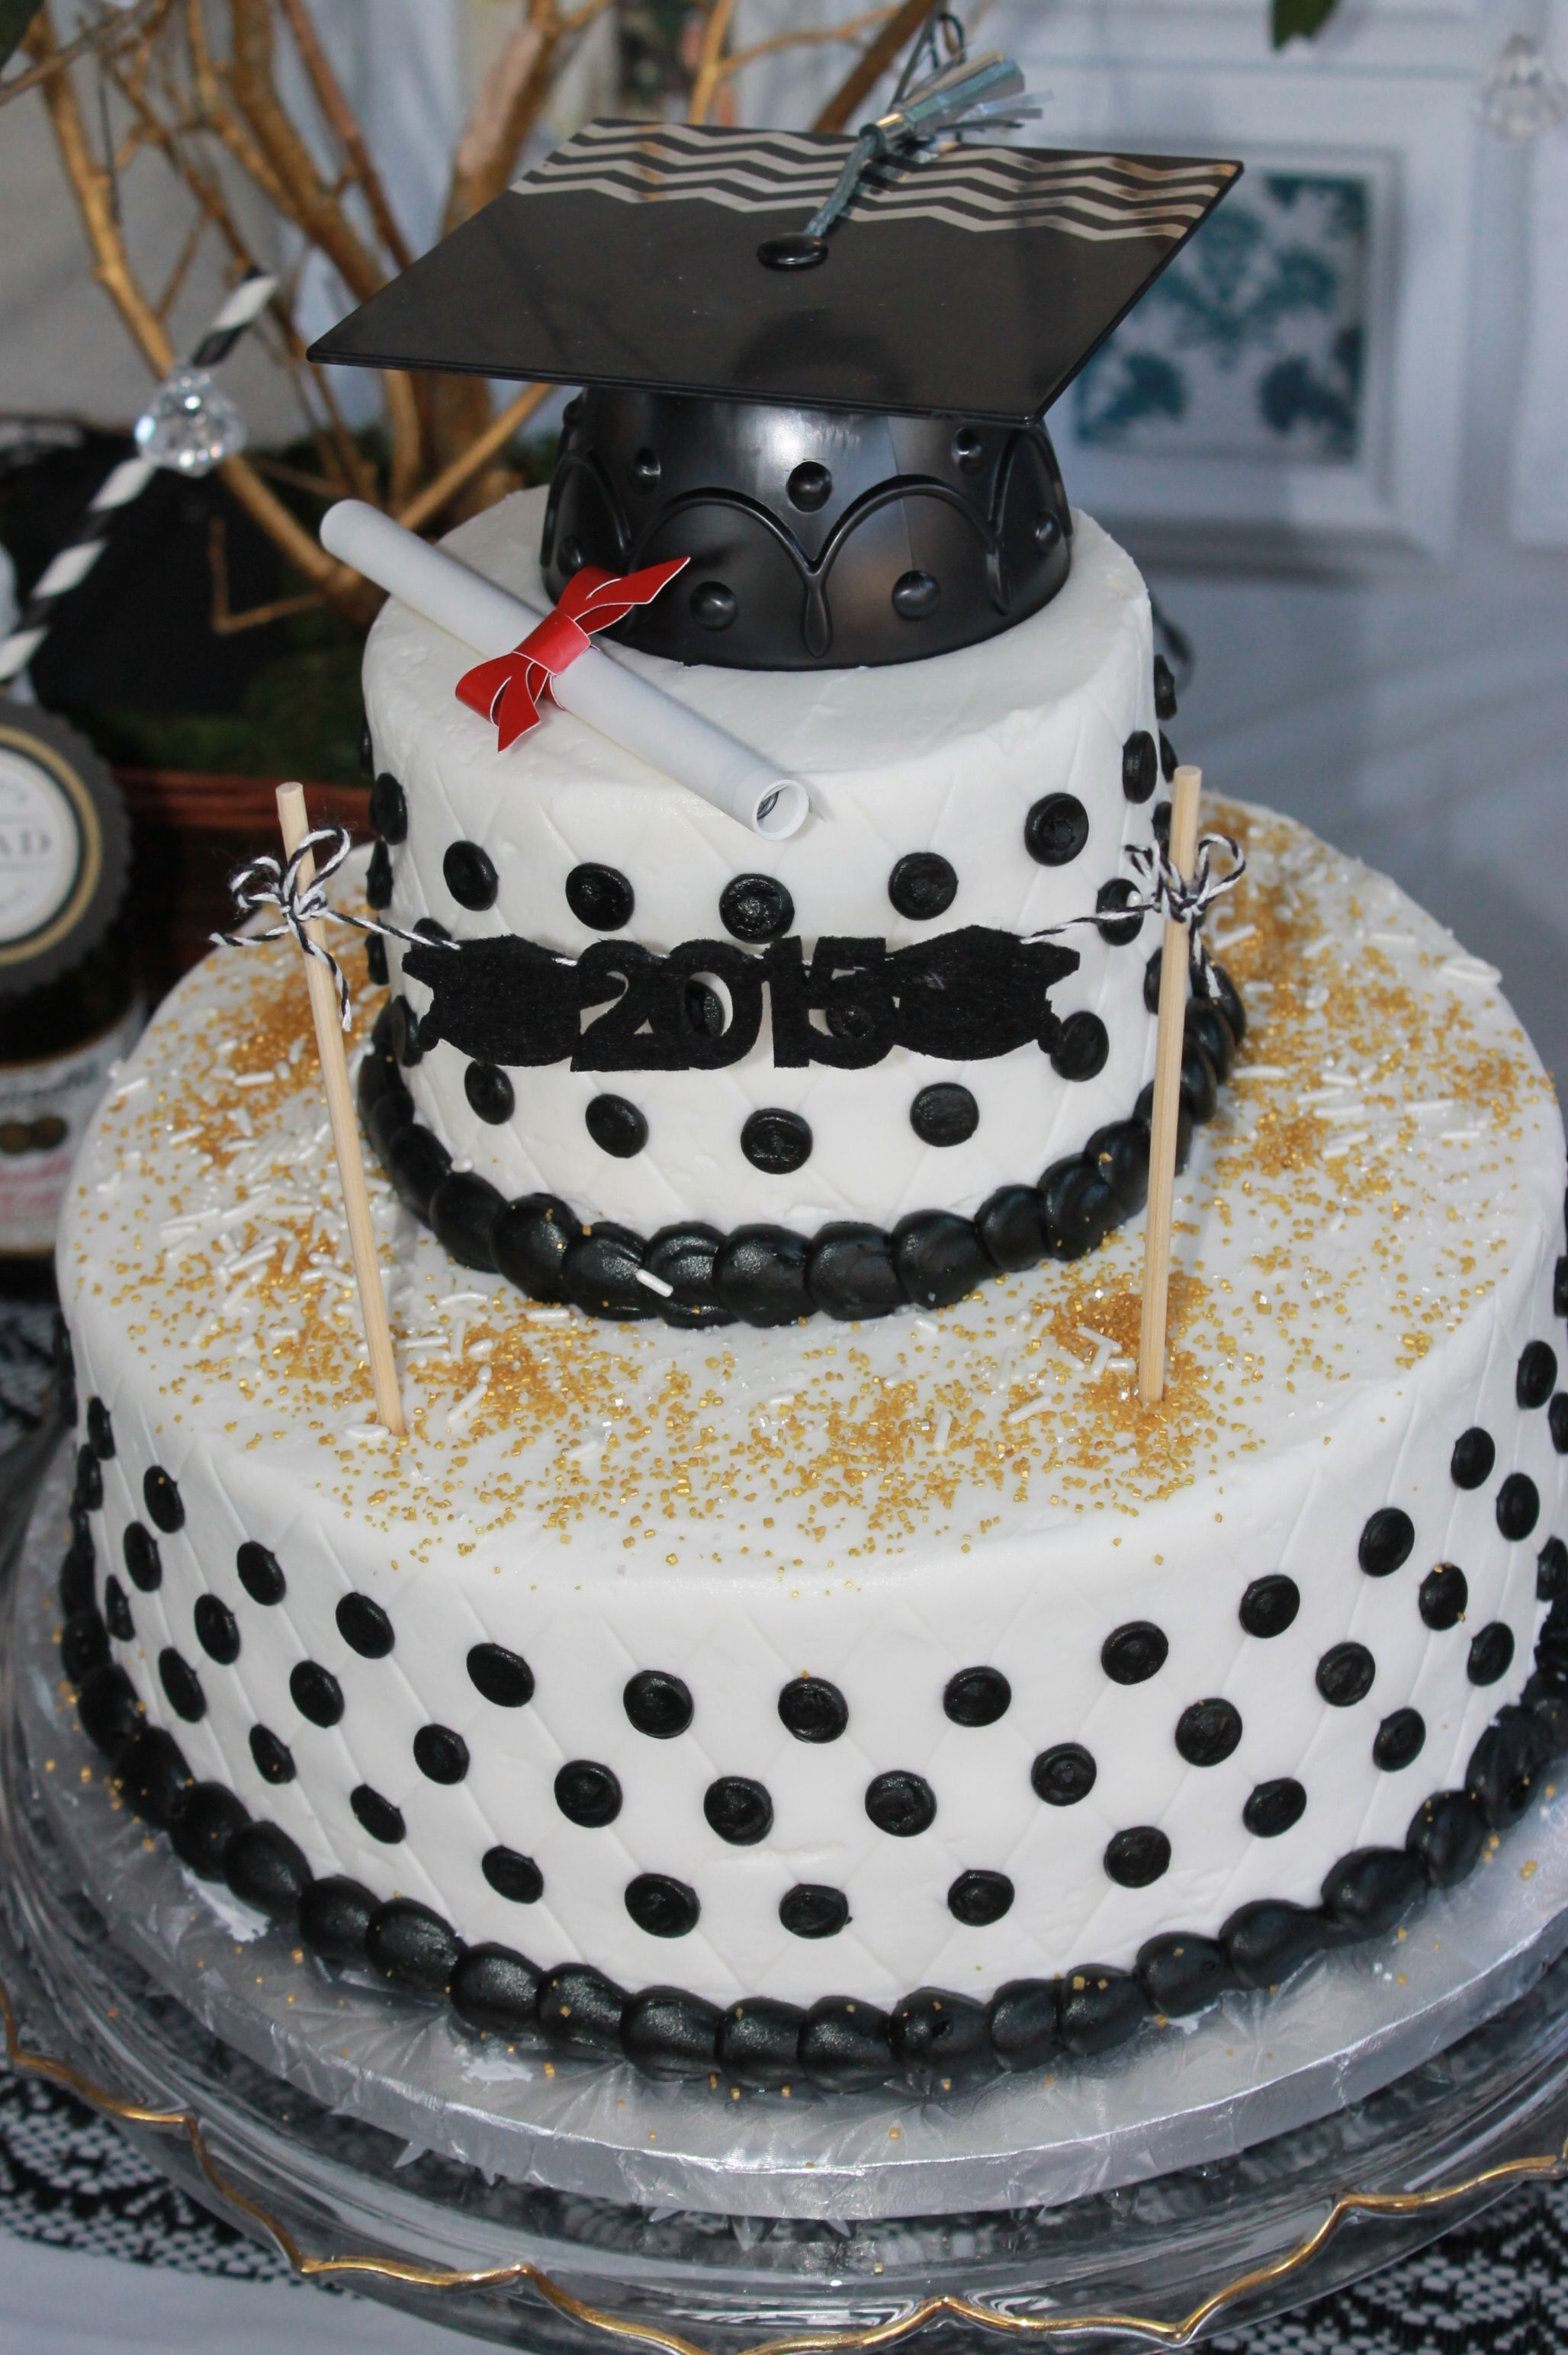 Cake from Sams club Black and White Graduation cake under 35